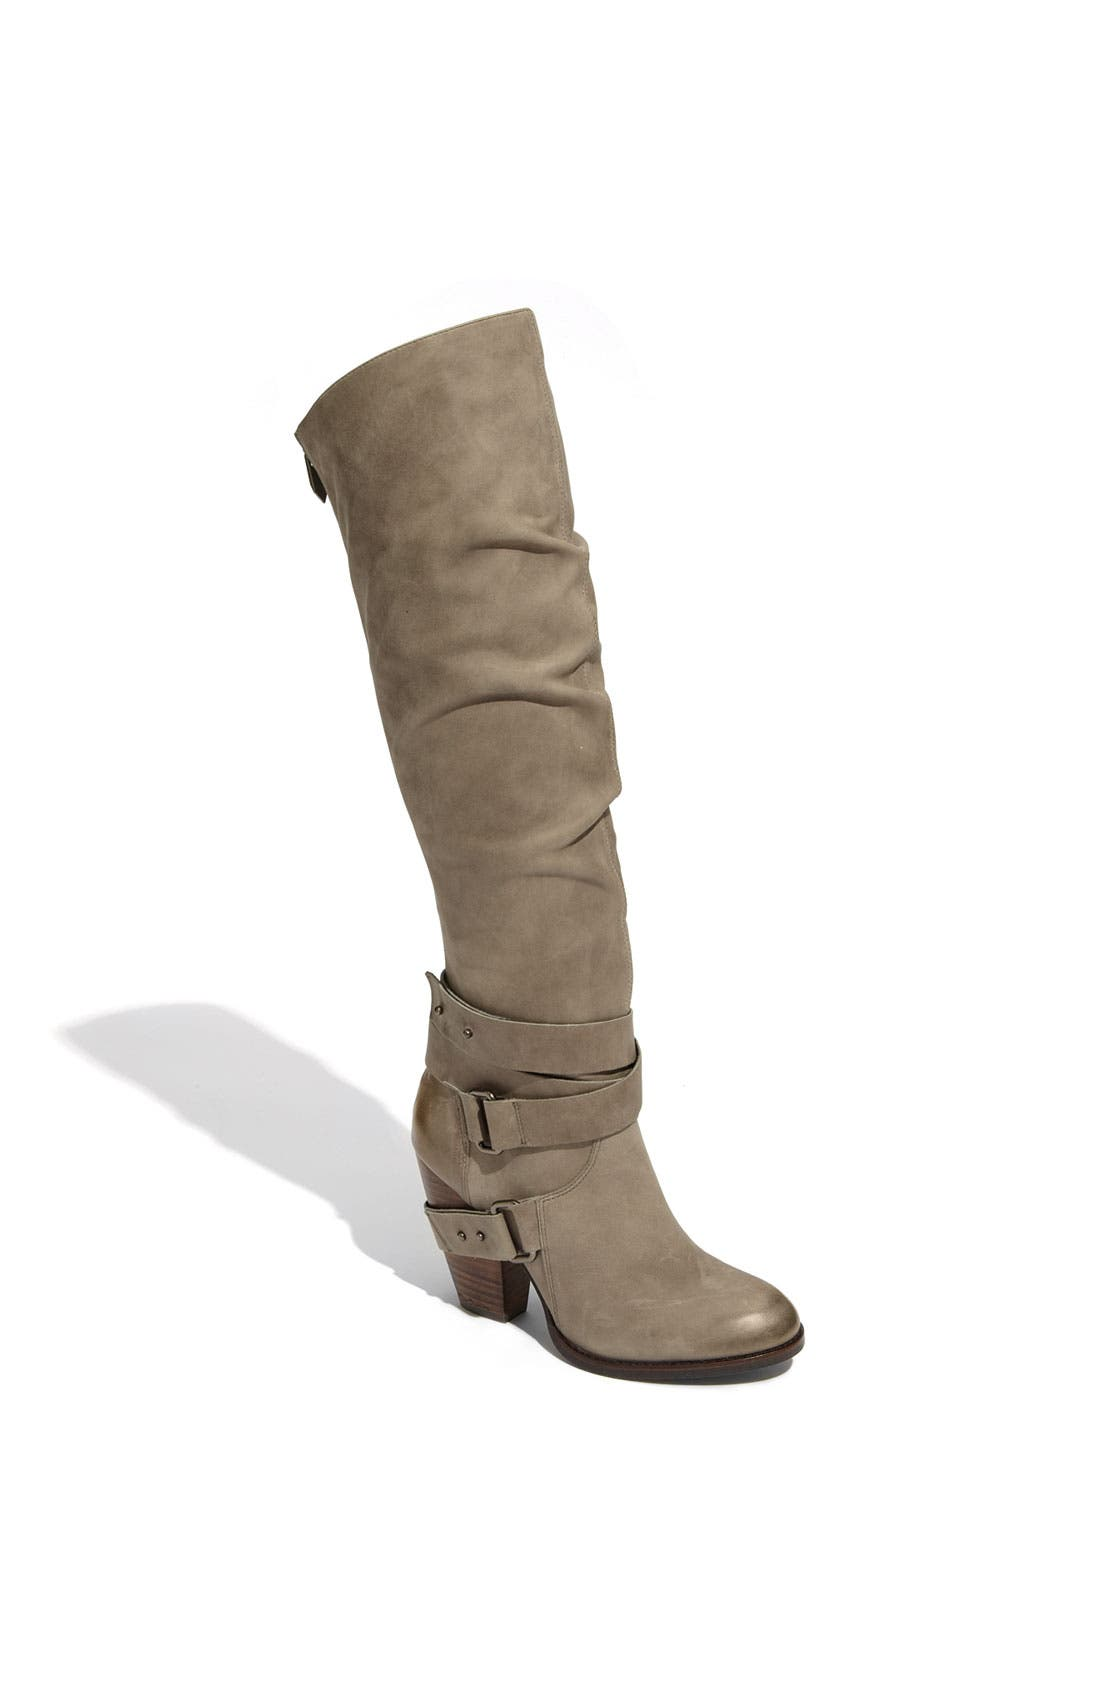 Alternate Image 1 Selected - Fergie 'Varsity' Boot